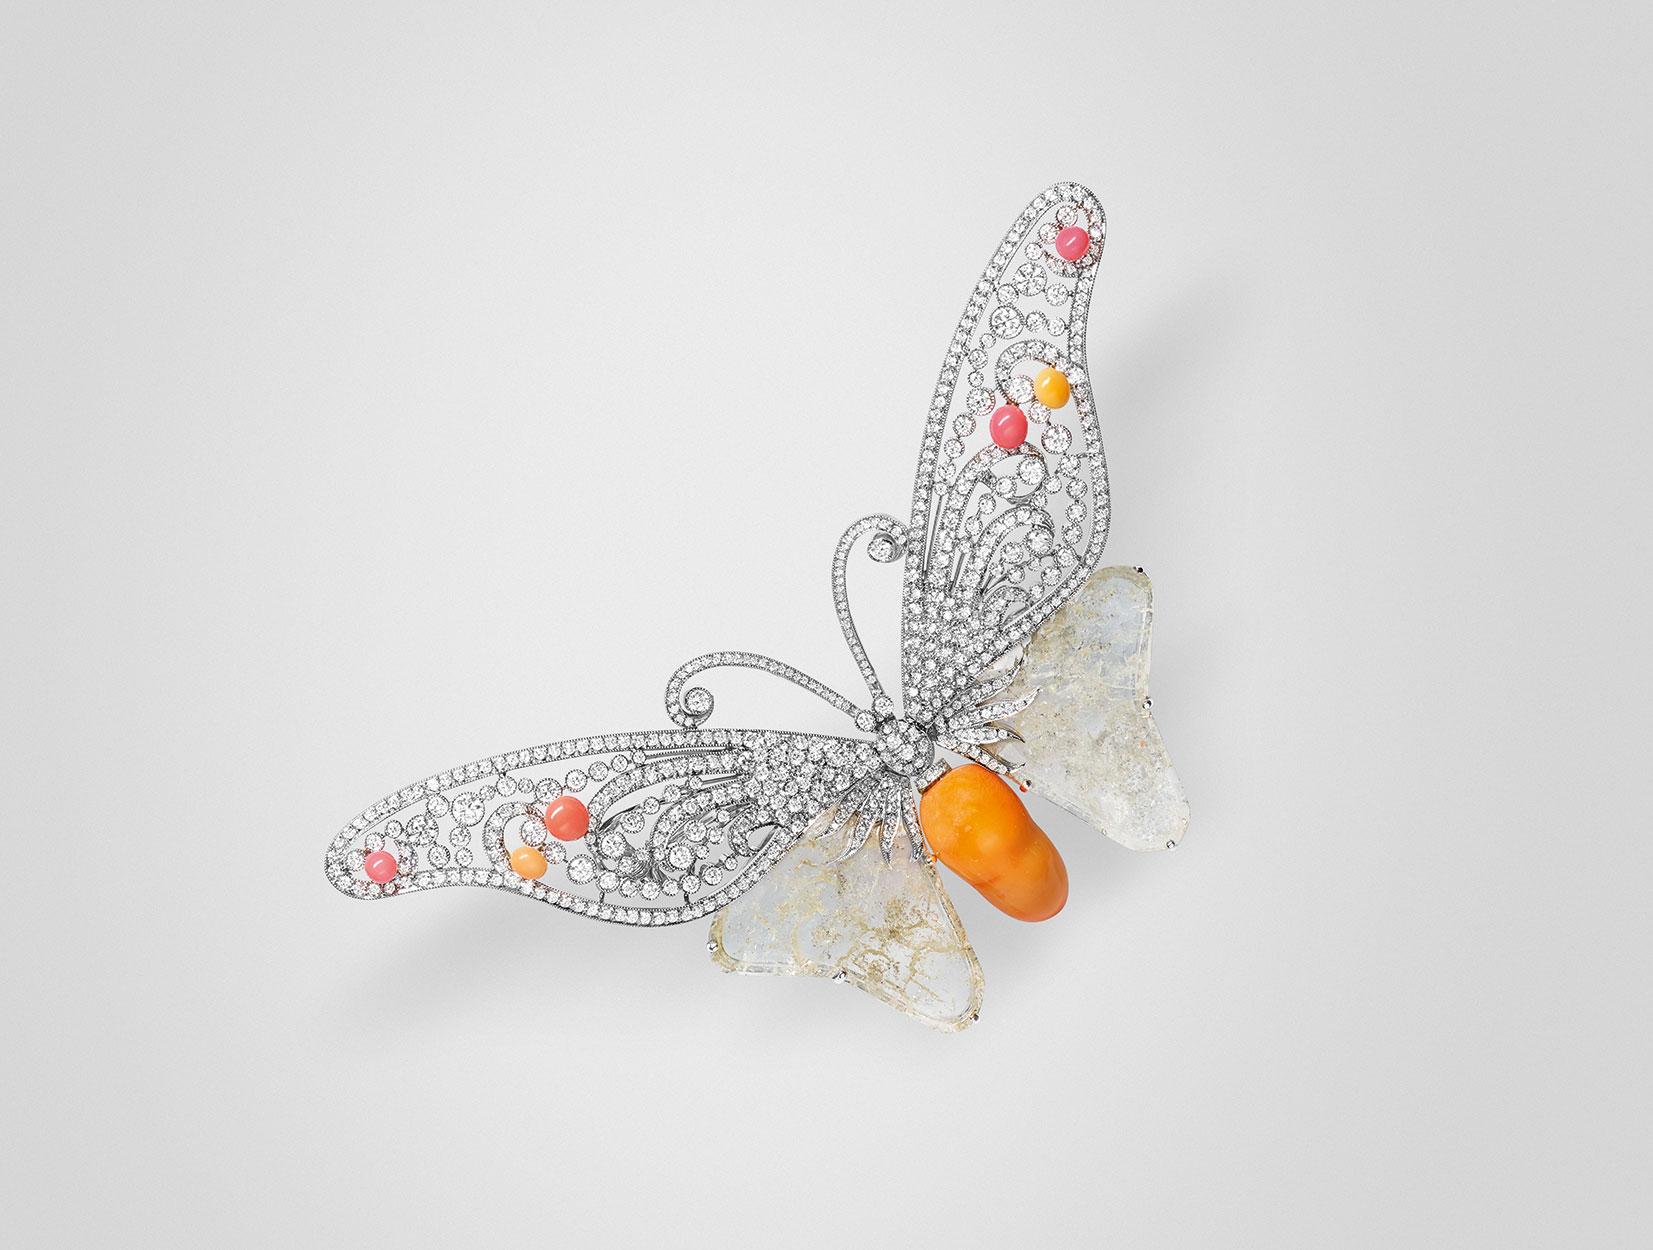 Conch Pearls Brooch 02 | Maria Gaspari